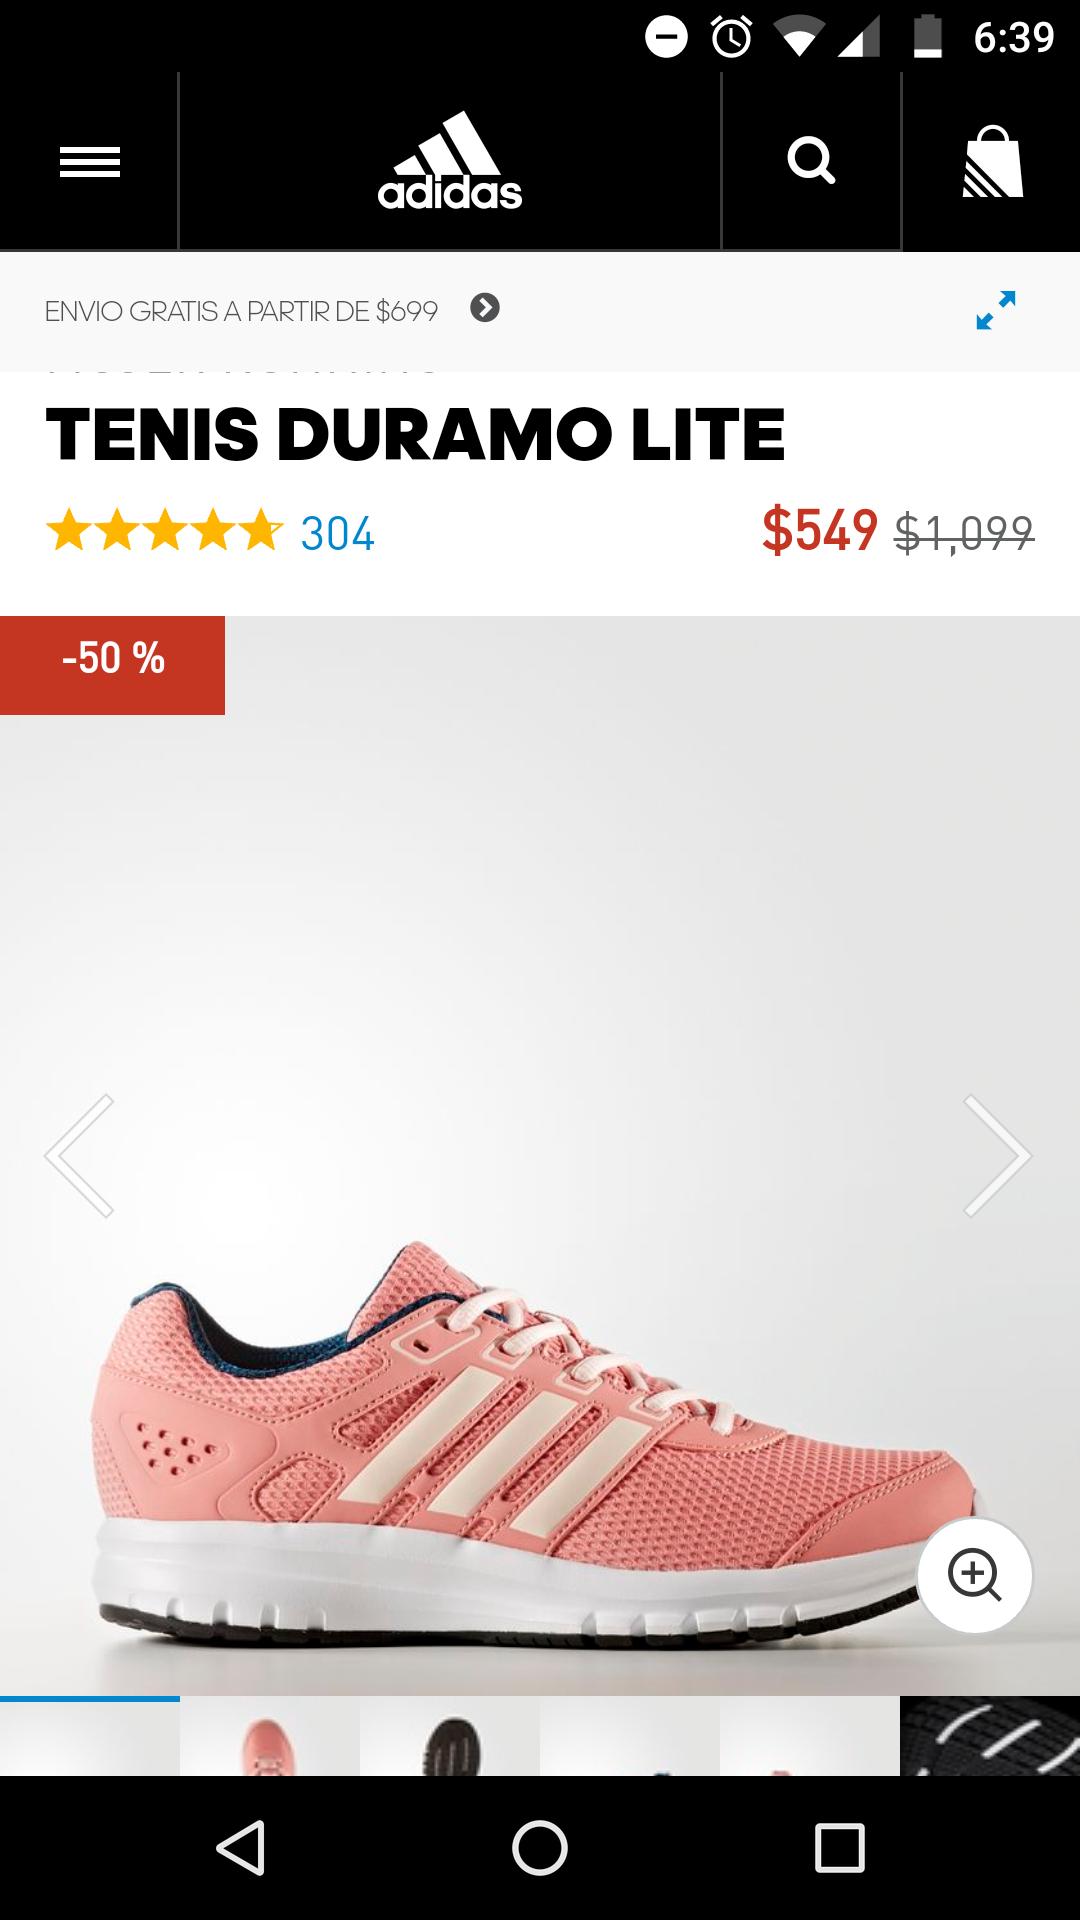 Adidas: Tenis Duramo Lite